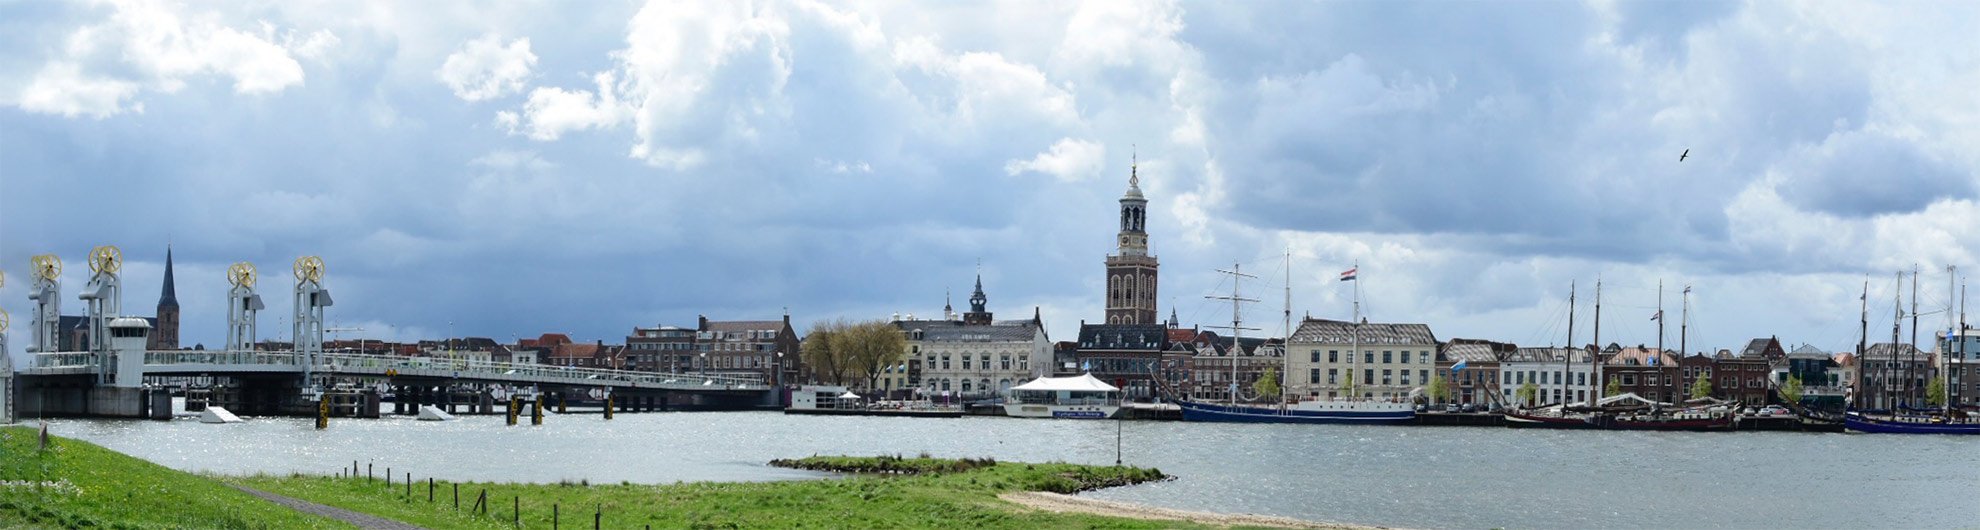 Stadsgezicht Kampen